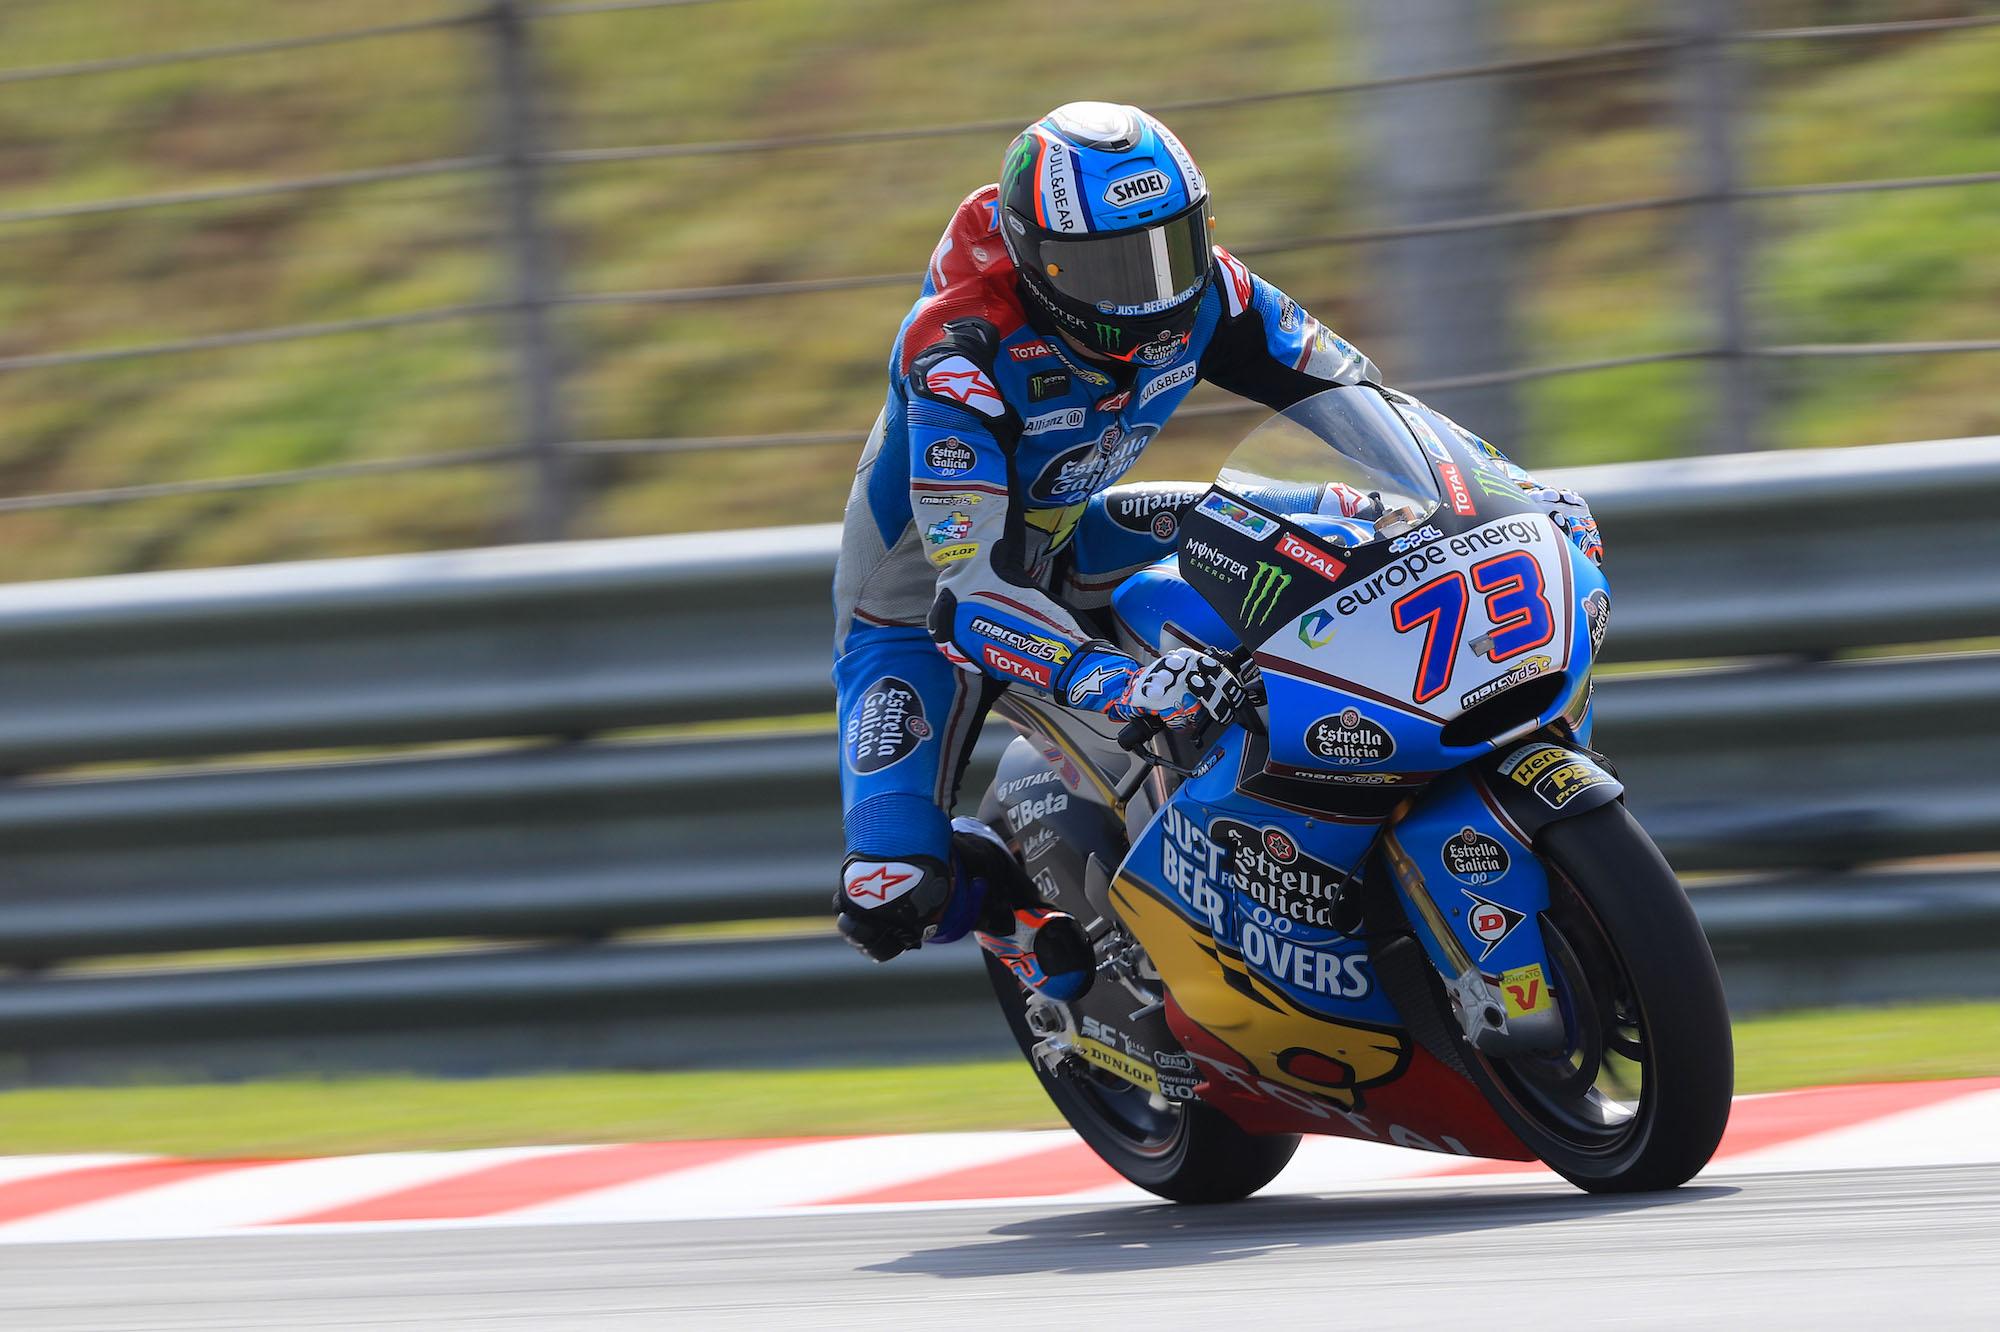 Álex Márquez inicia el GP de Malasia de la mejor manera